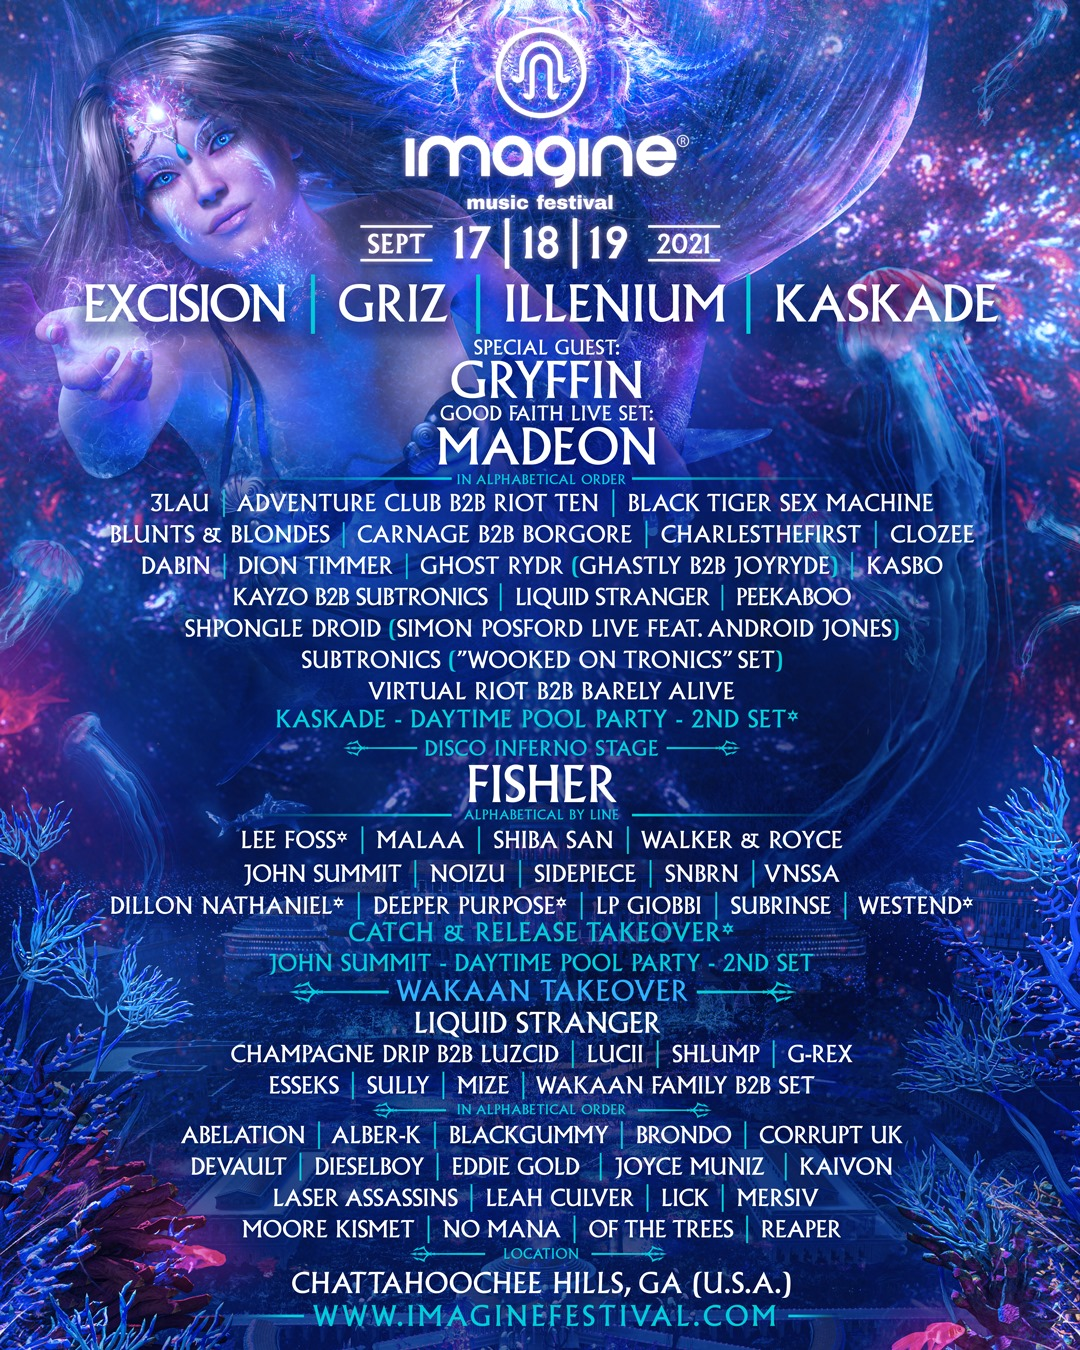 Imagine Music Festival 2021